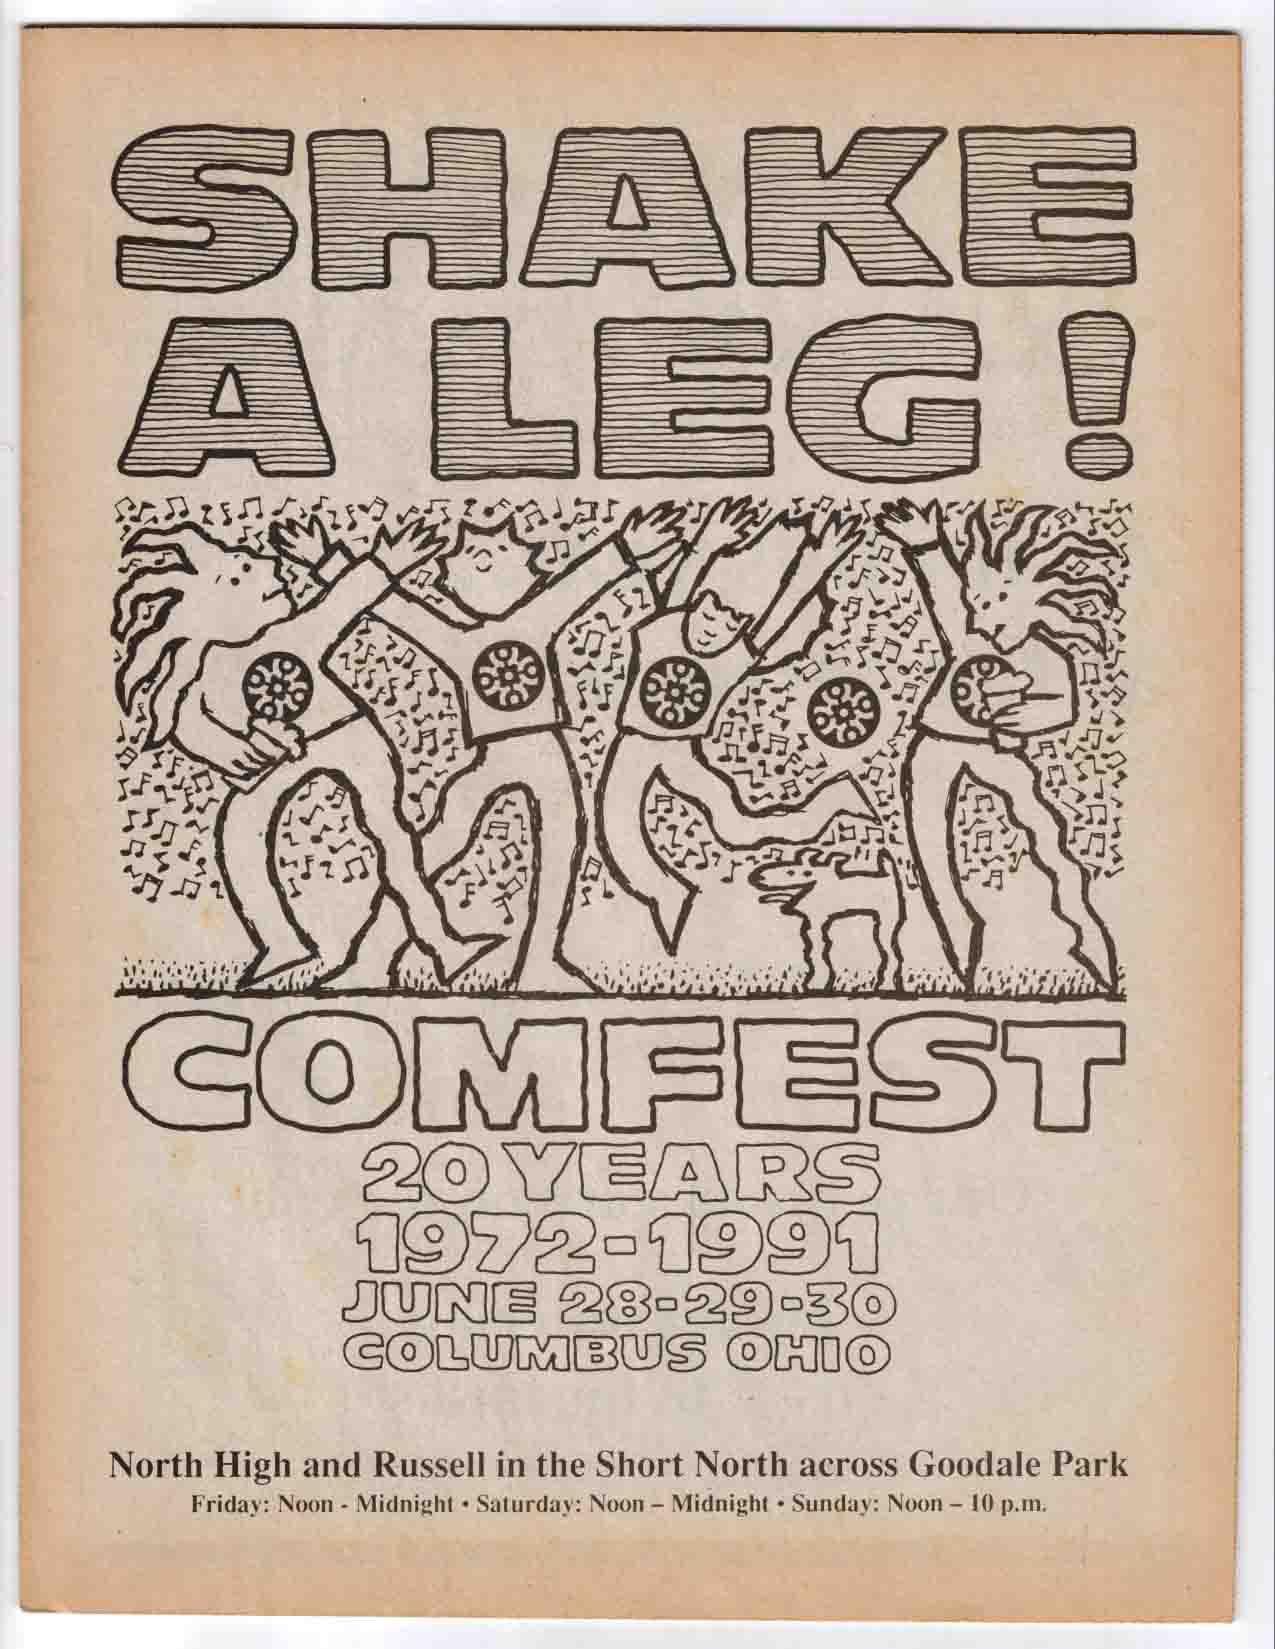 1991 Comfest_program-1